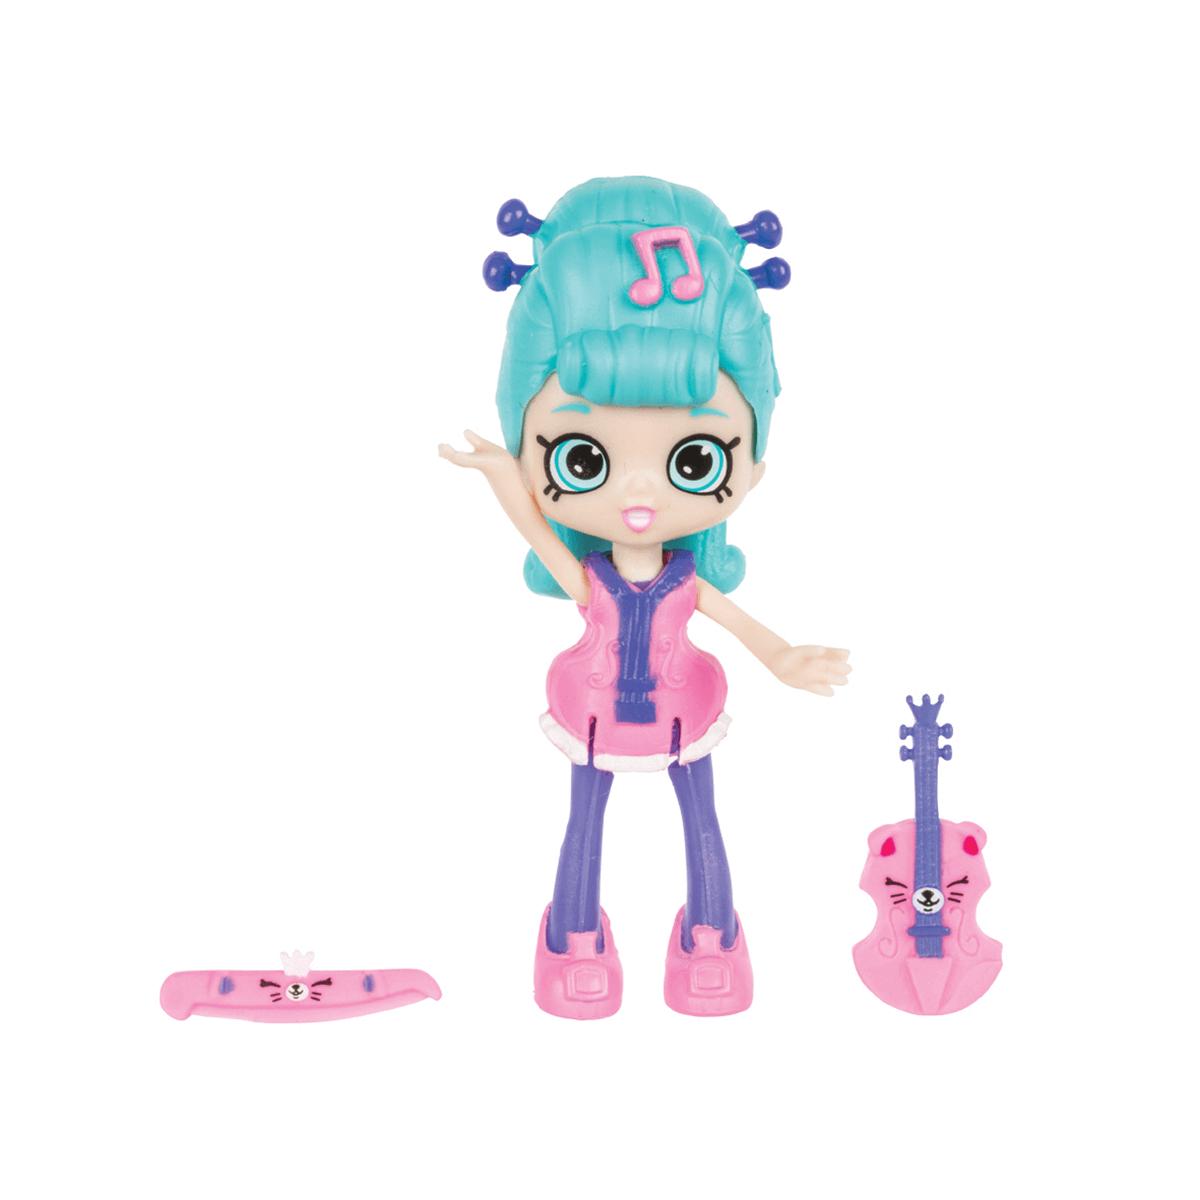 Shopkins Happy Places Doll Series 4 Violette The Entertainer